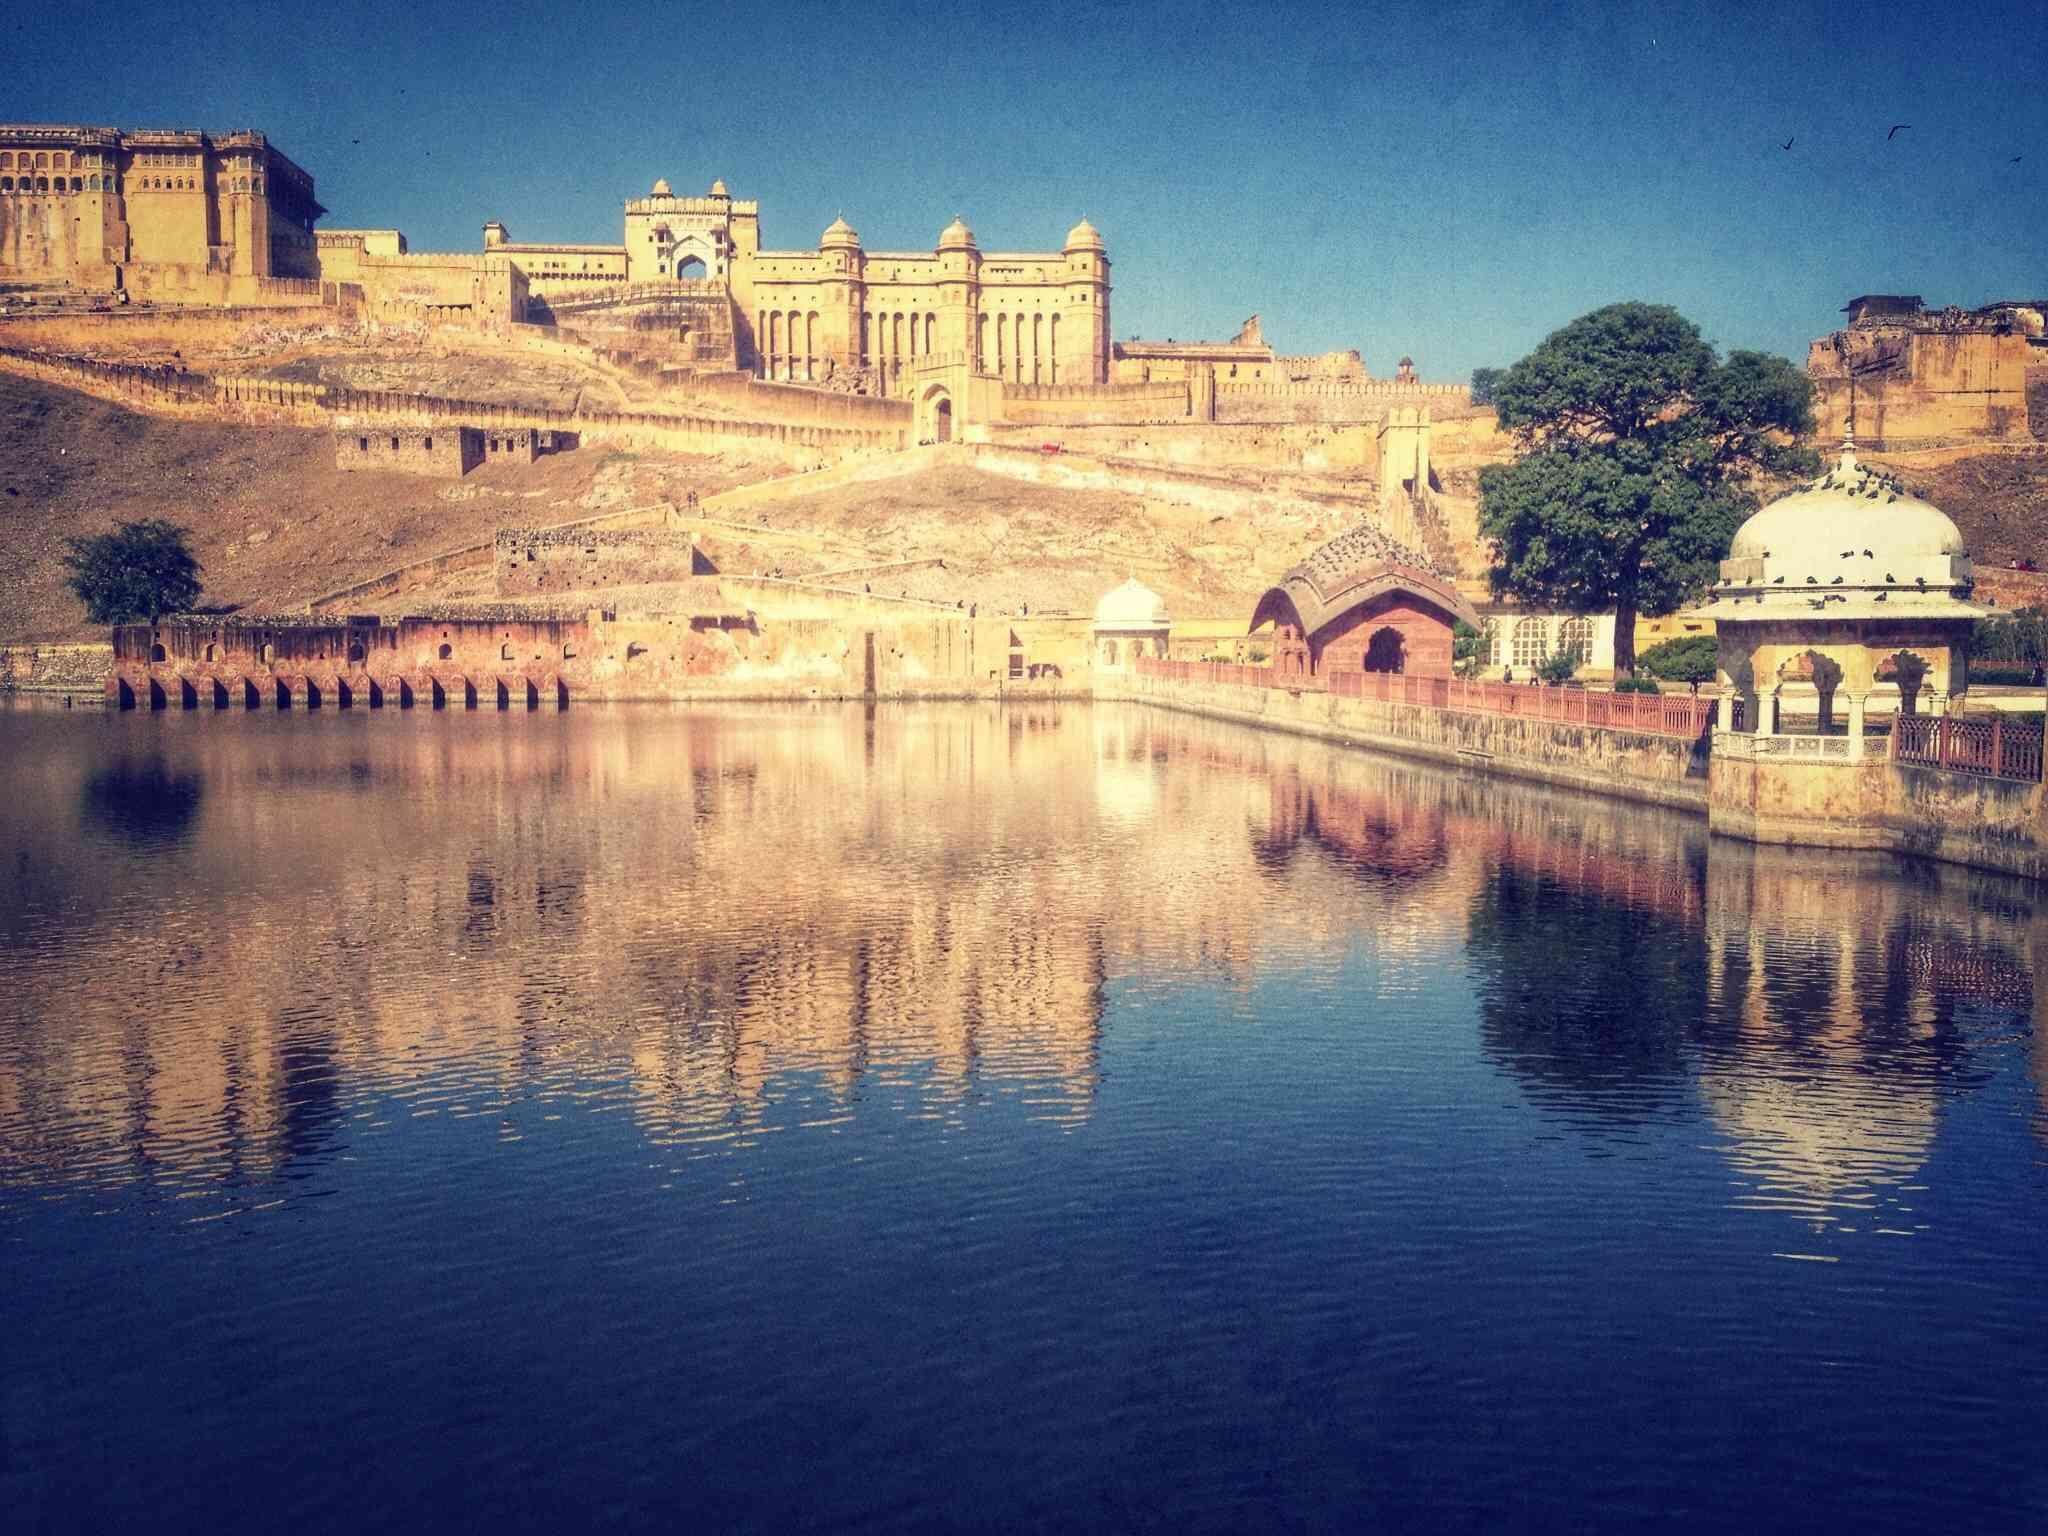 Rajasthan Heritage Fort Palace